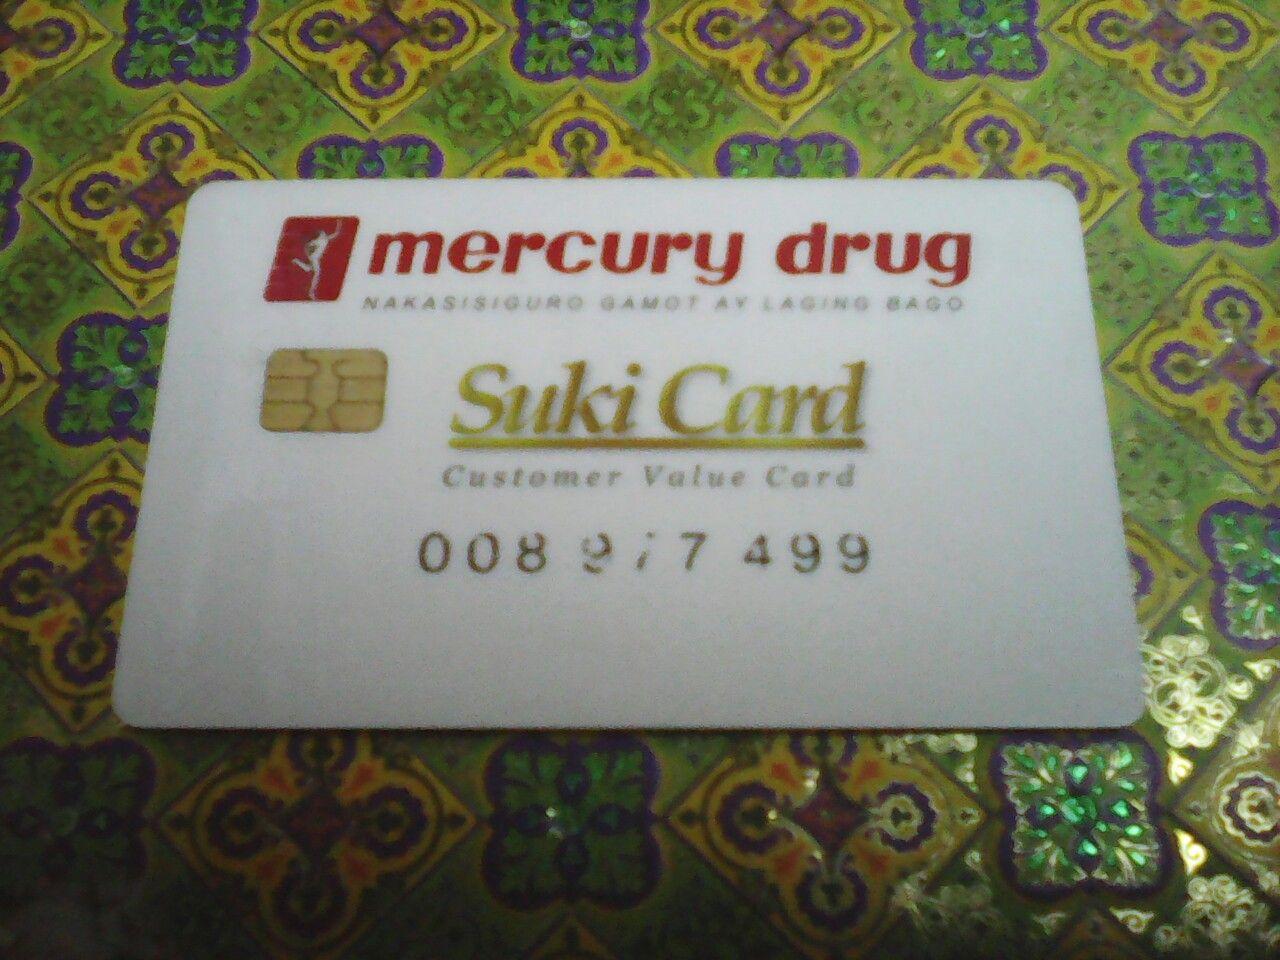 Mercury Drug Suki Card Palawan Express Pera